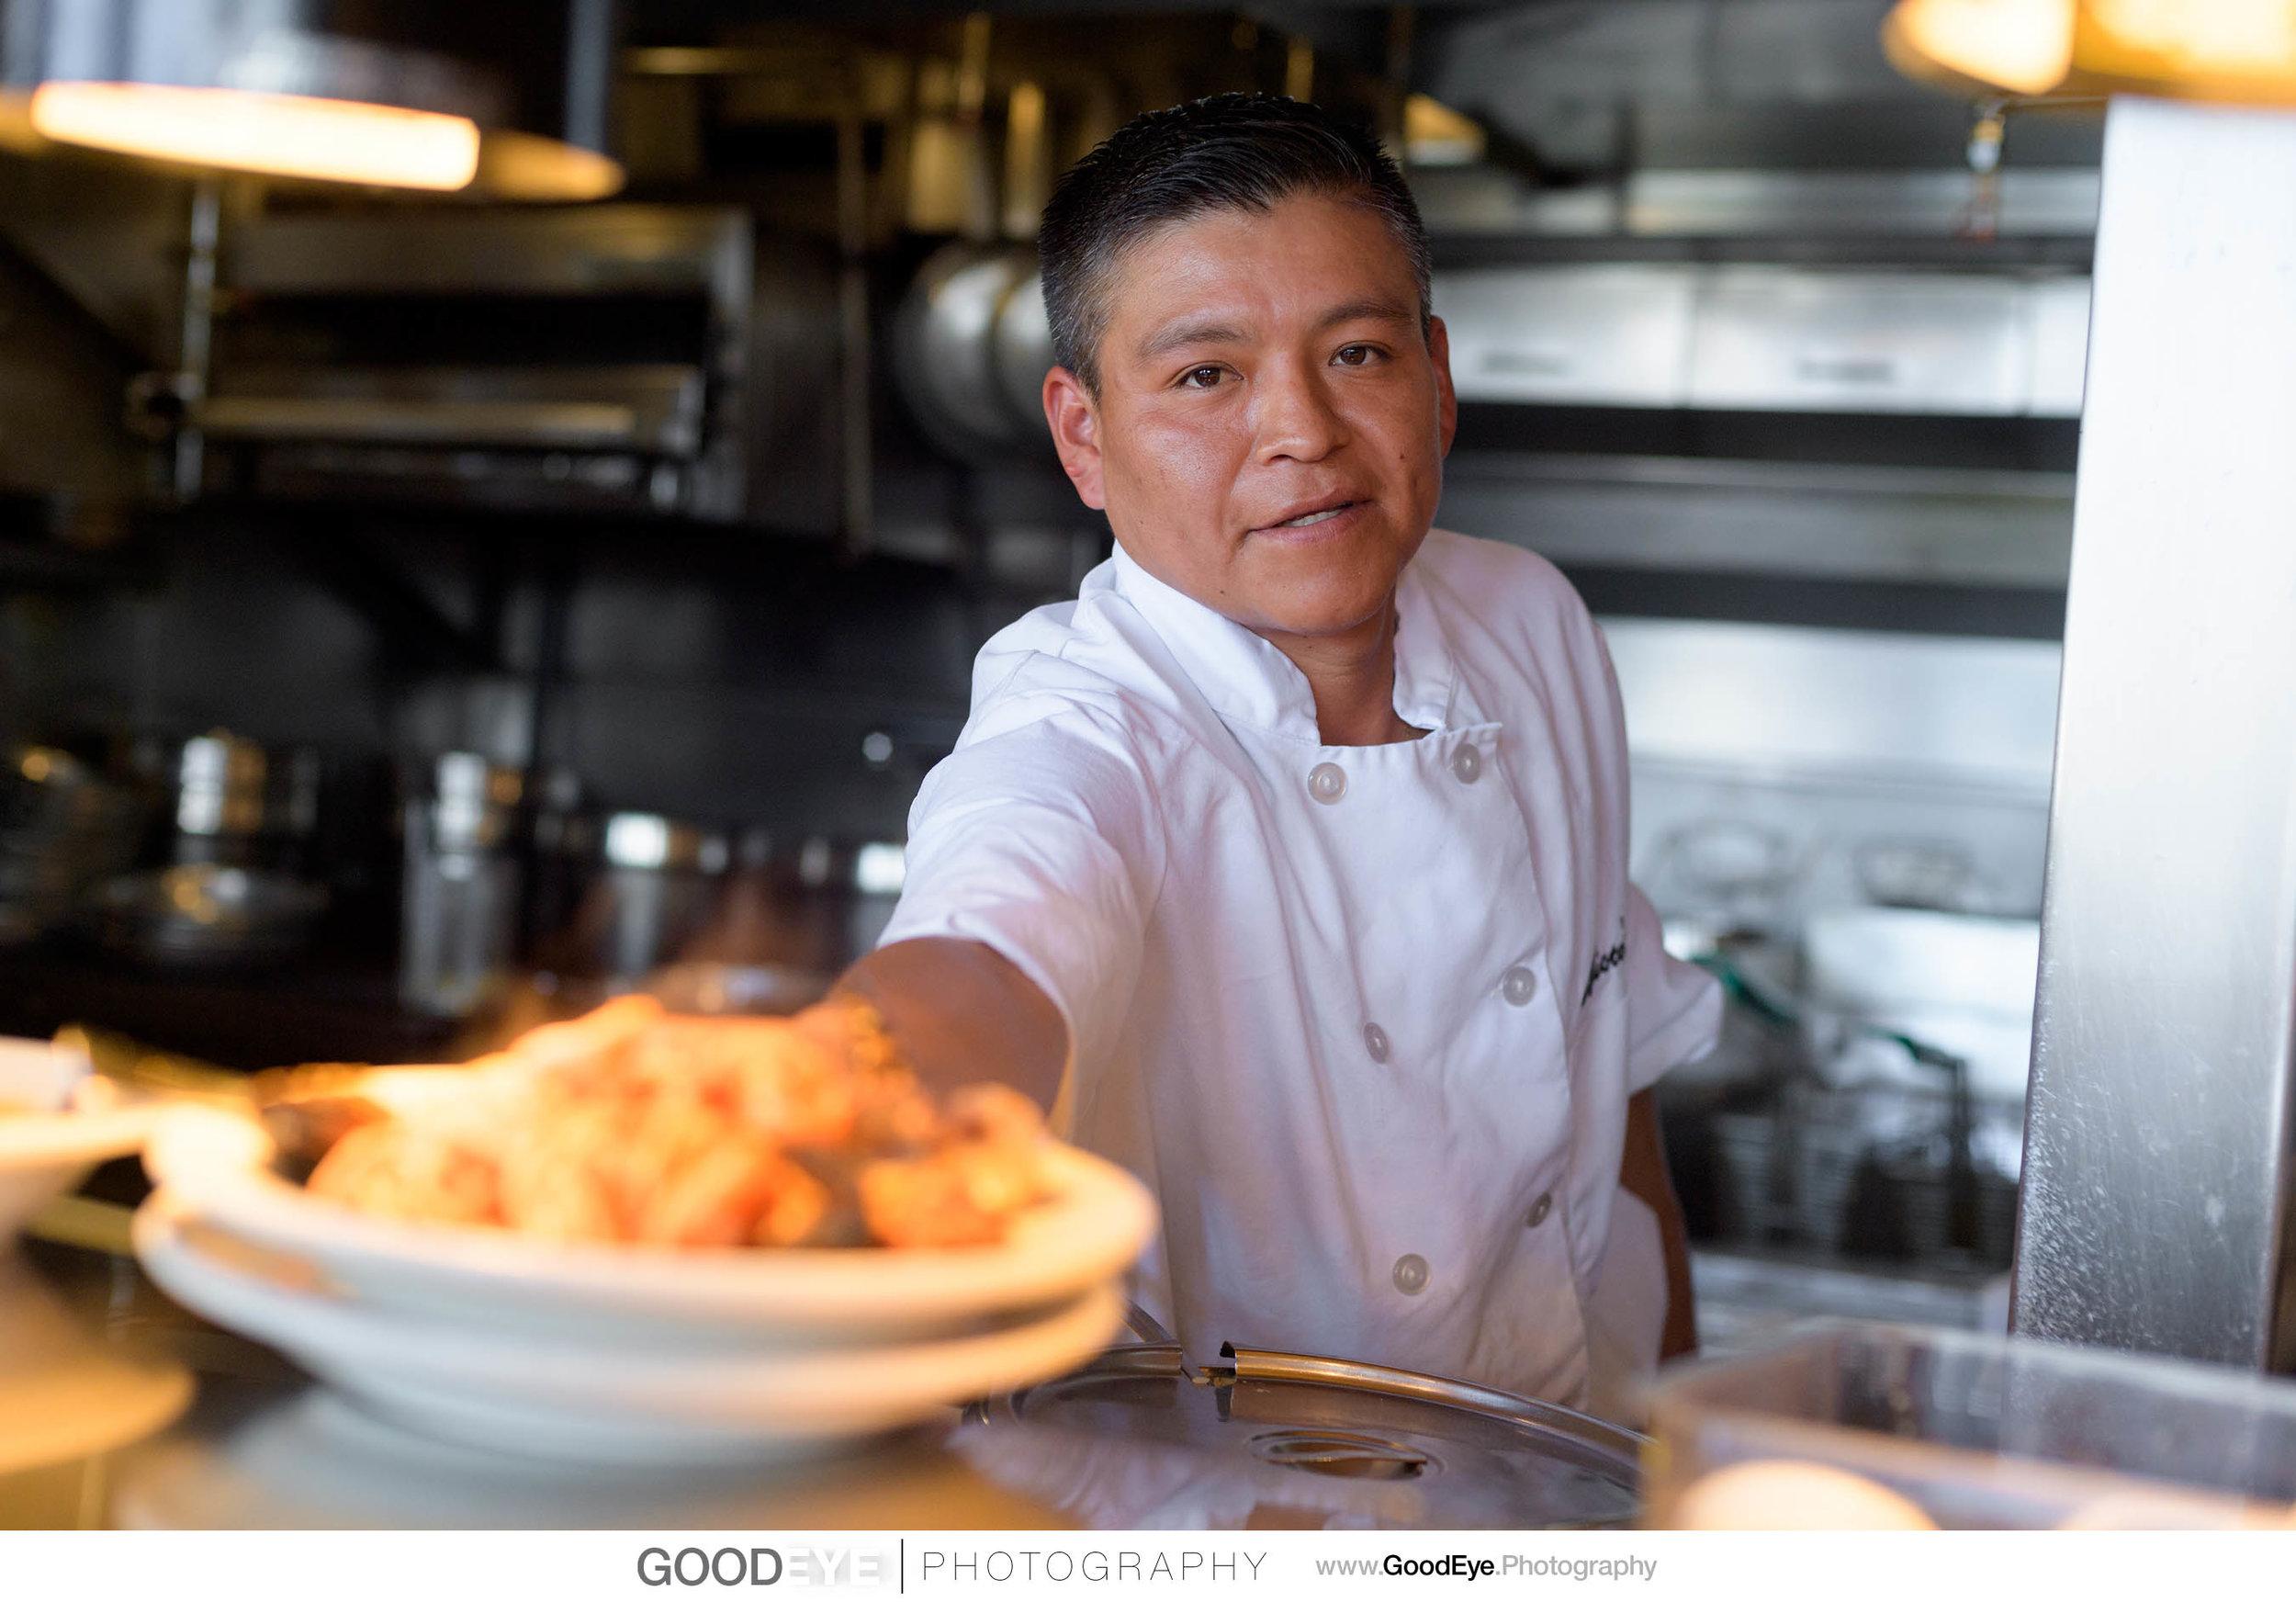 4905_Cafe_8_Aliotos_San_Francisco_Food_Photography_web.jpg